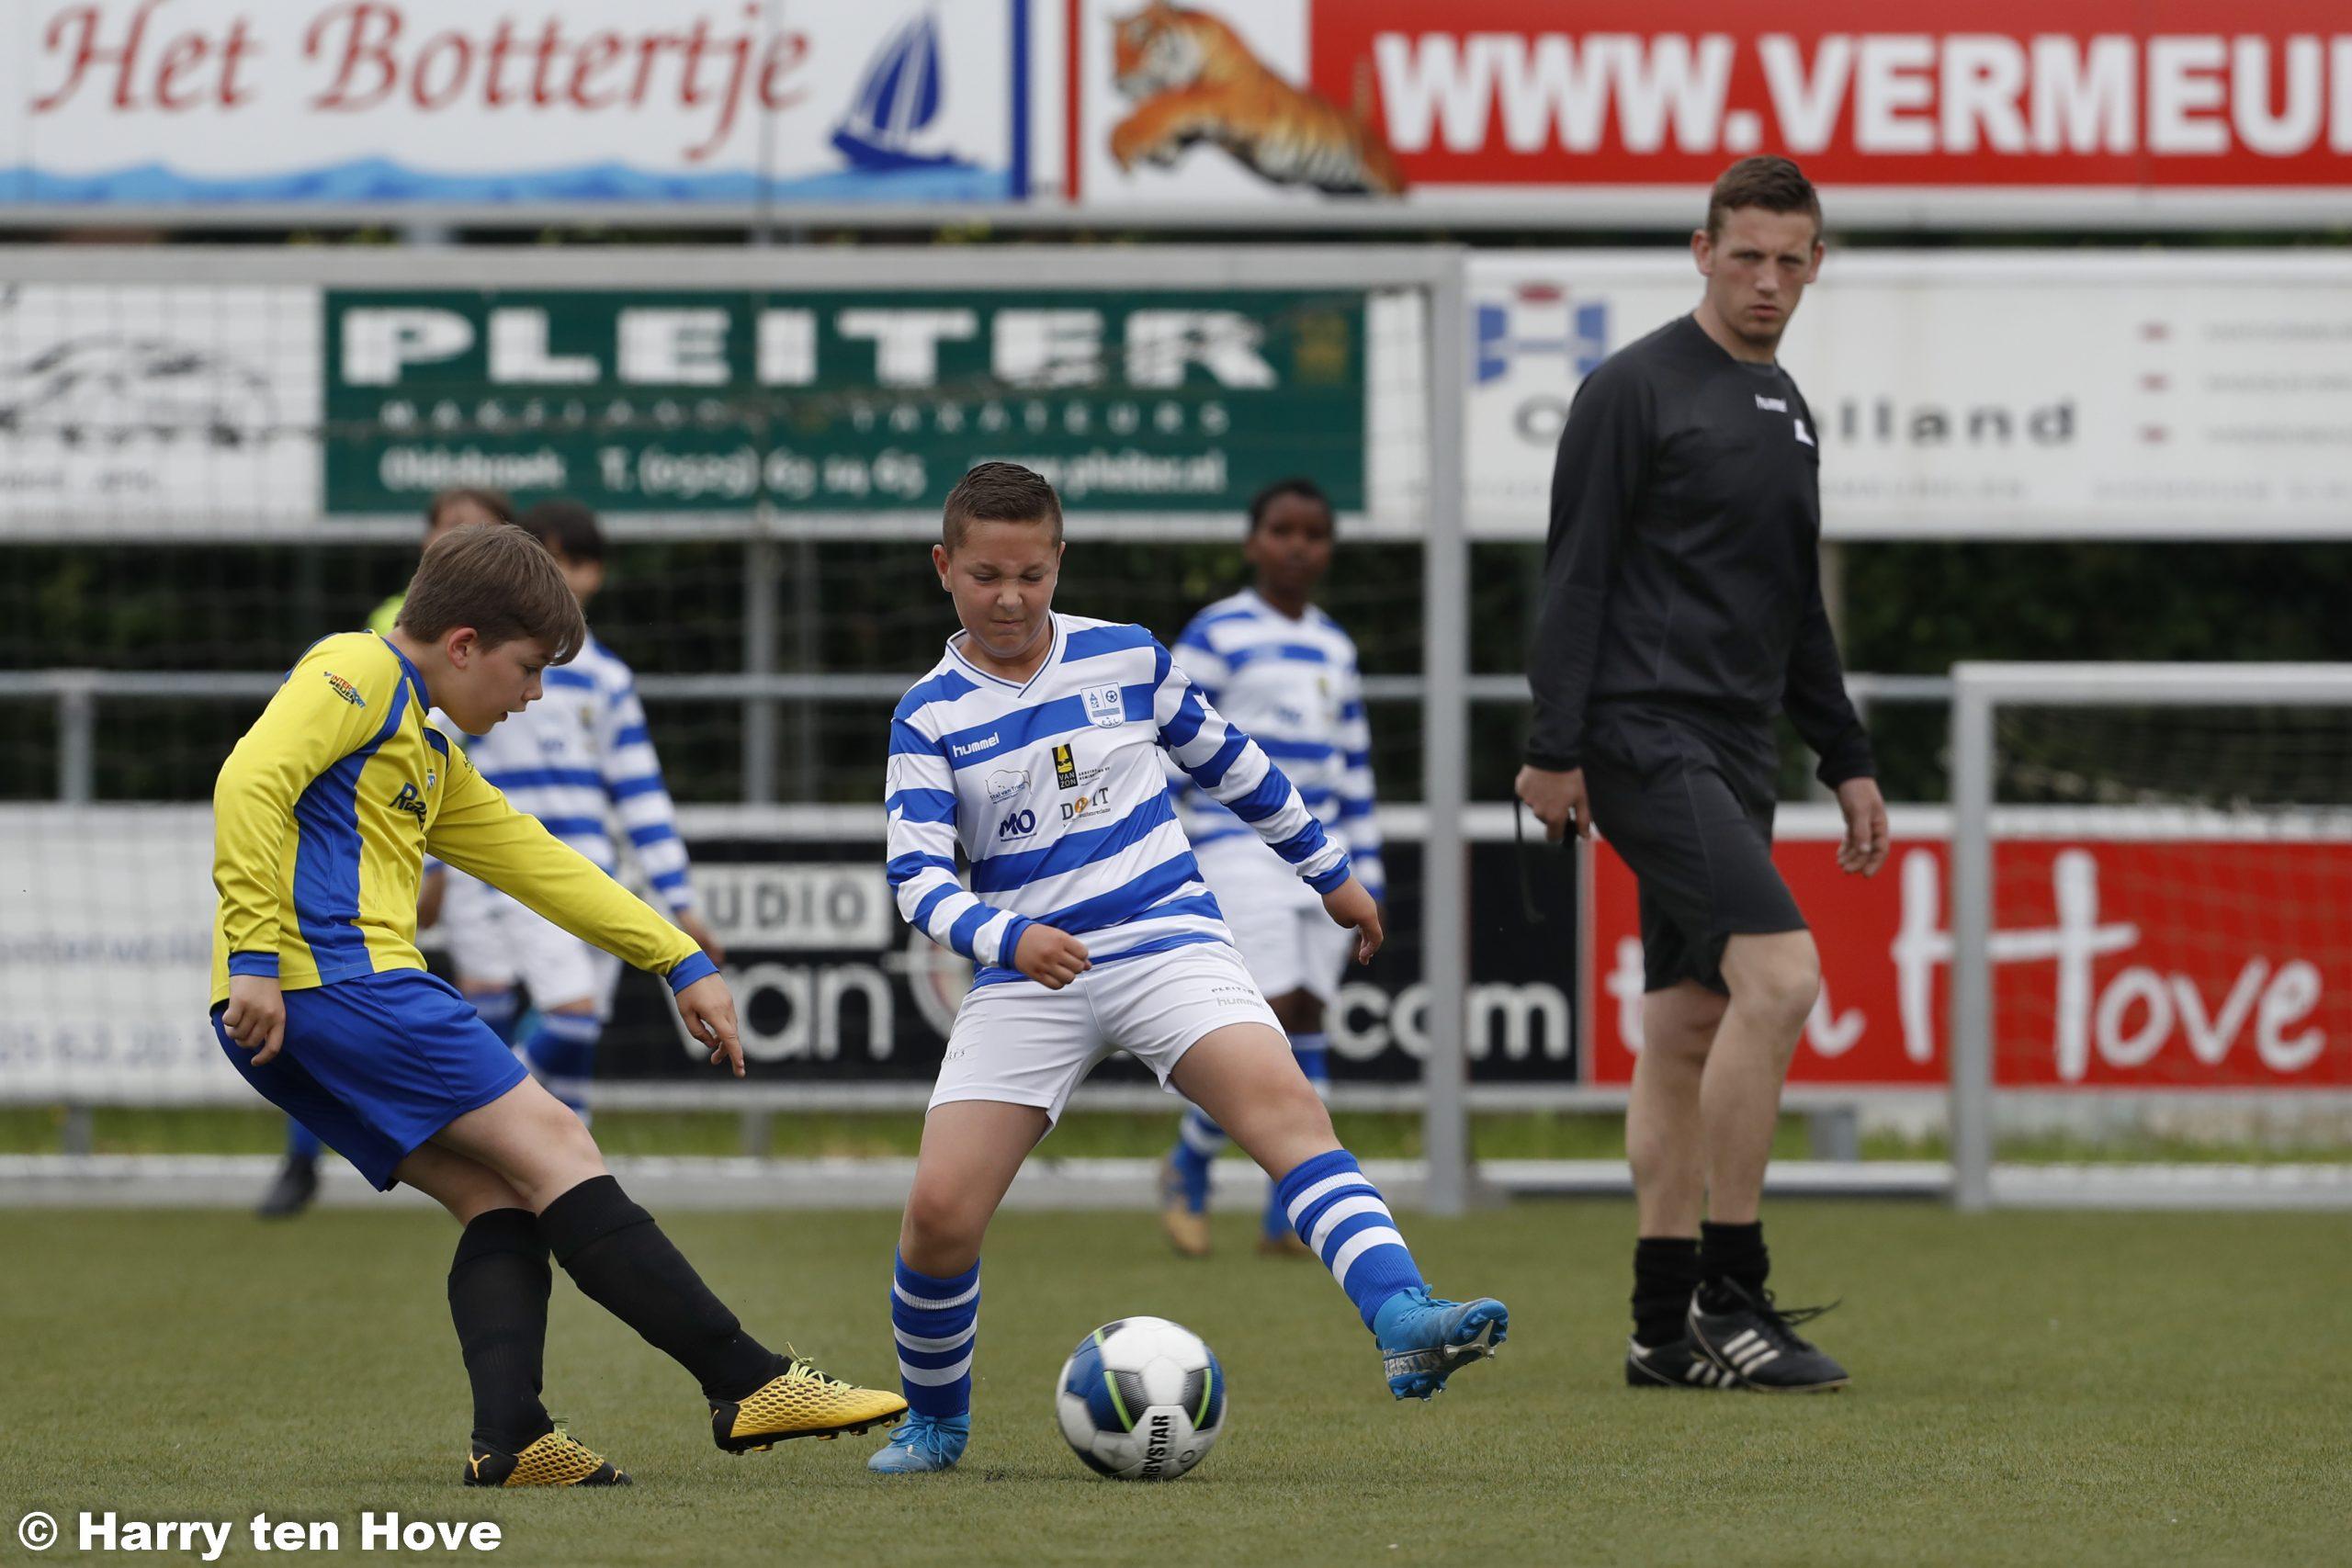 ElburgerSC - KNVB Regiocup van start